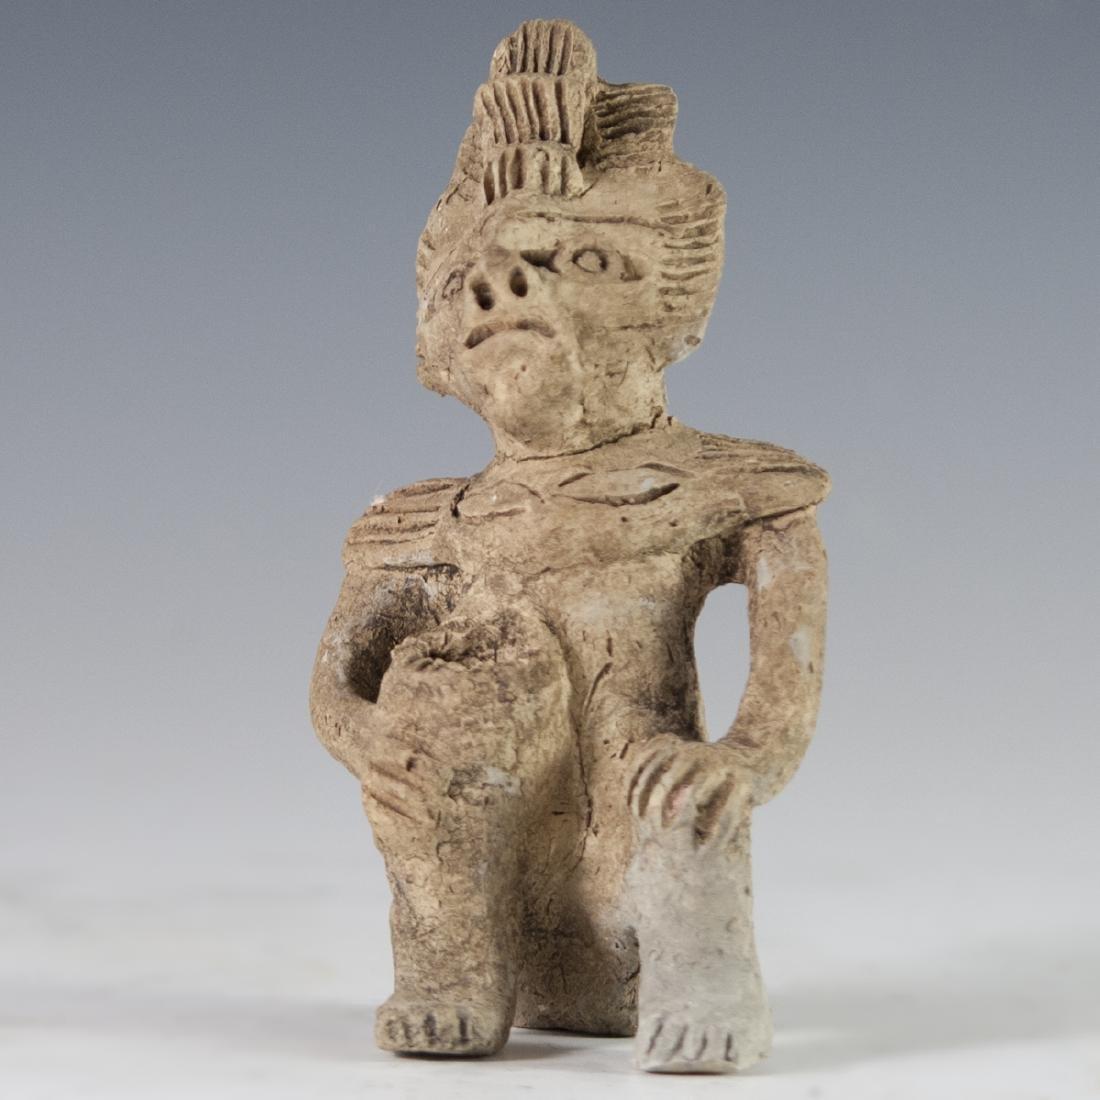 Possibly Pre-Columbian Mayan Effigy